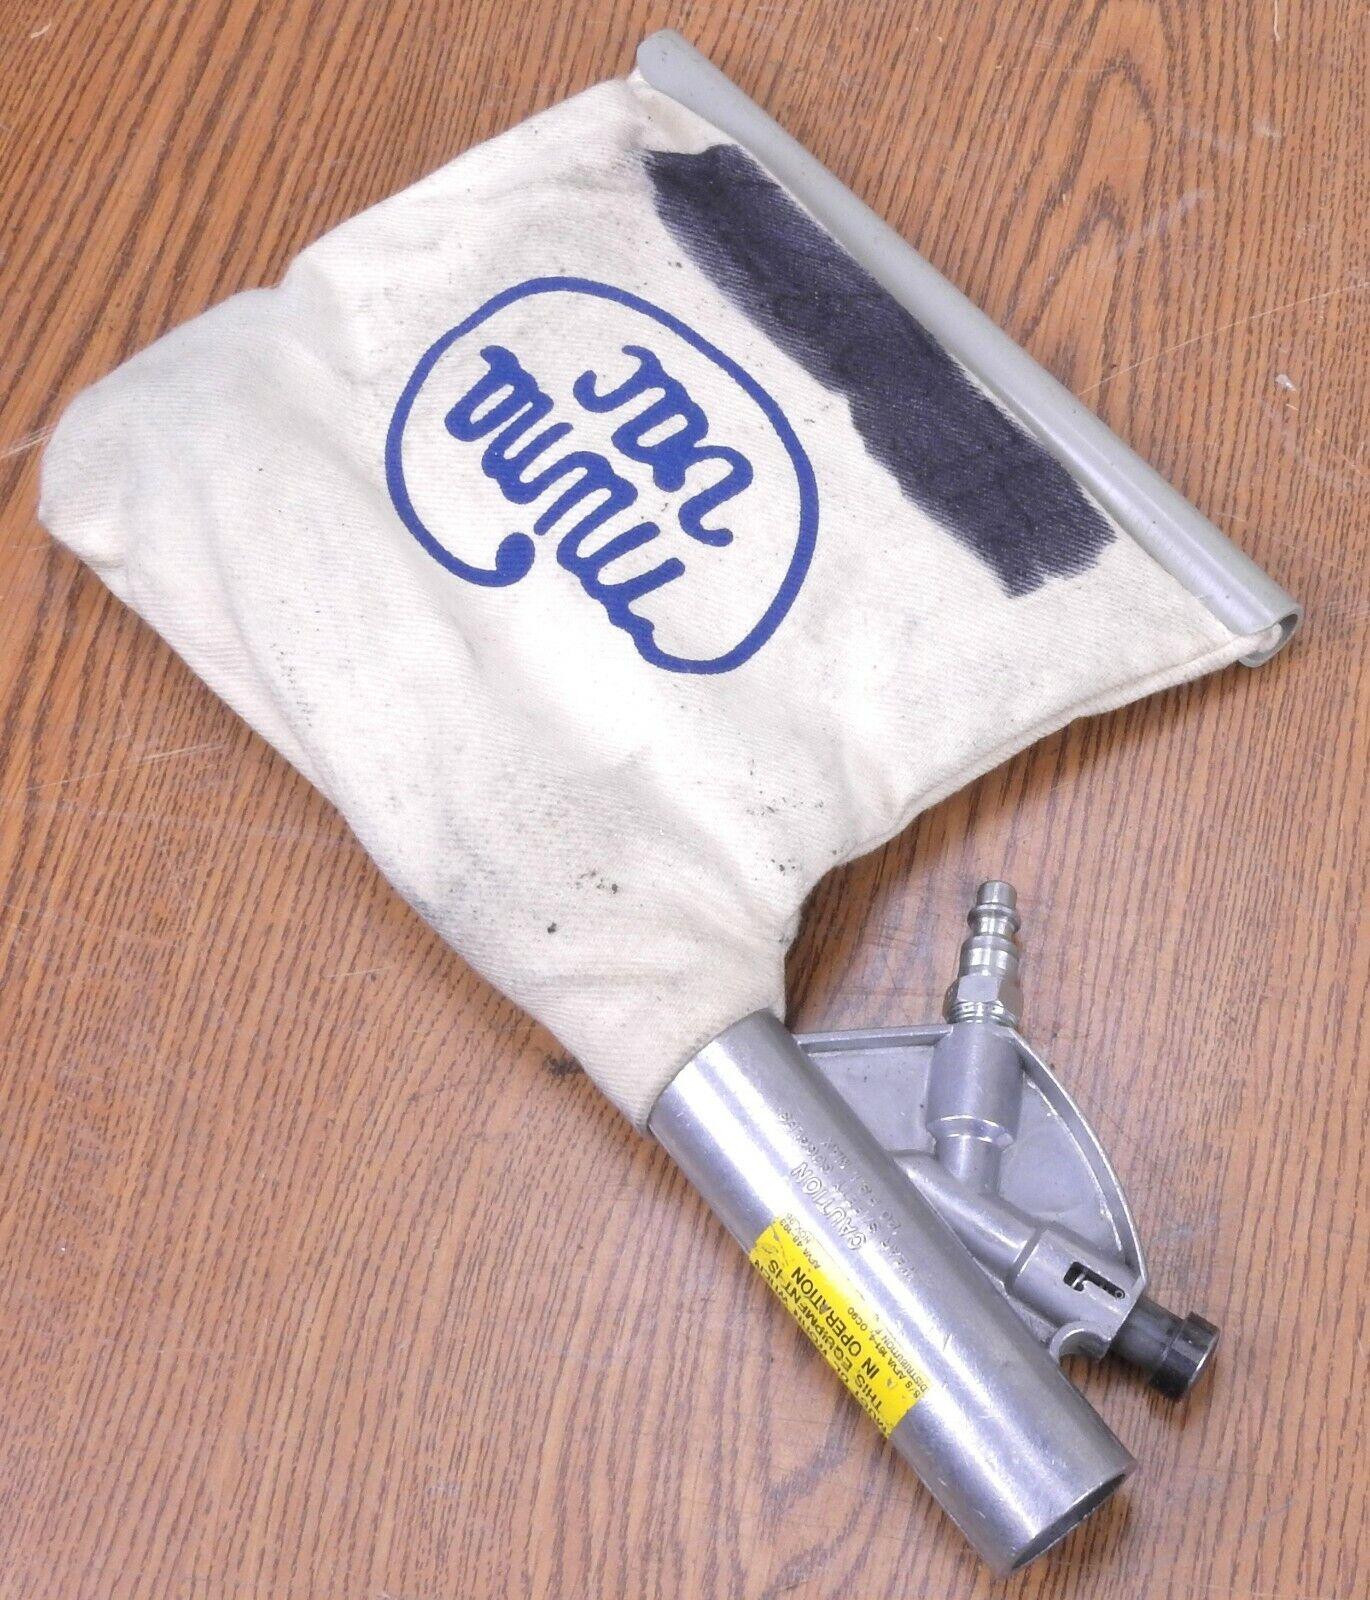 ATI Mina-Vac Hand Held Air Vacuum